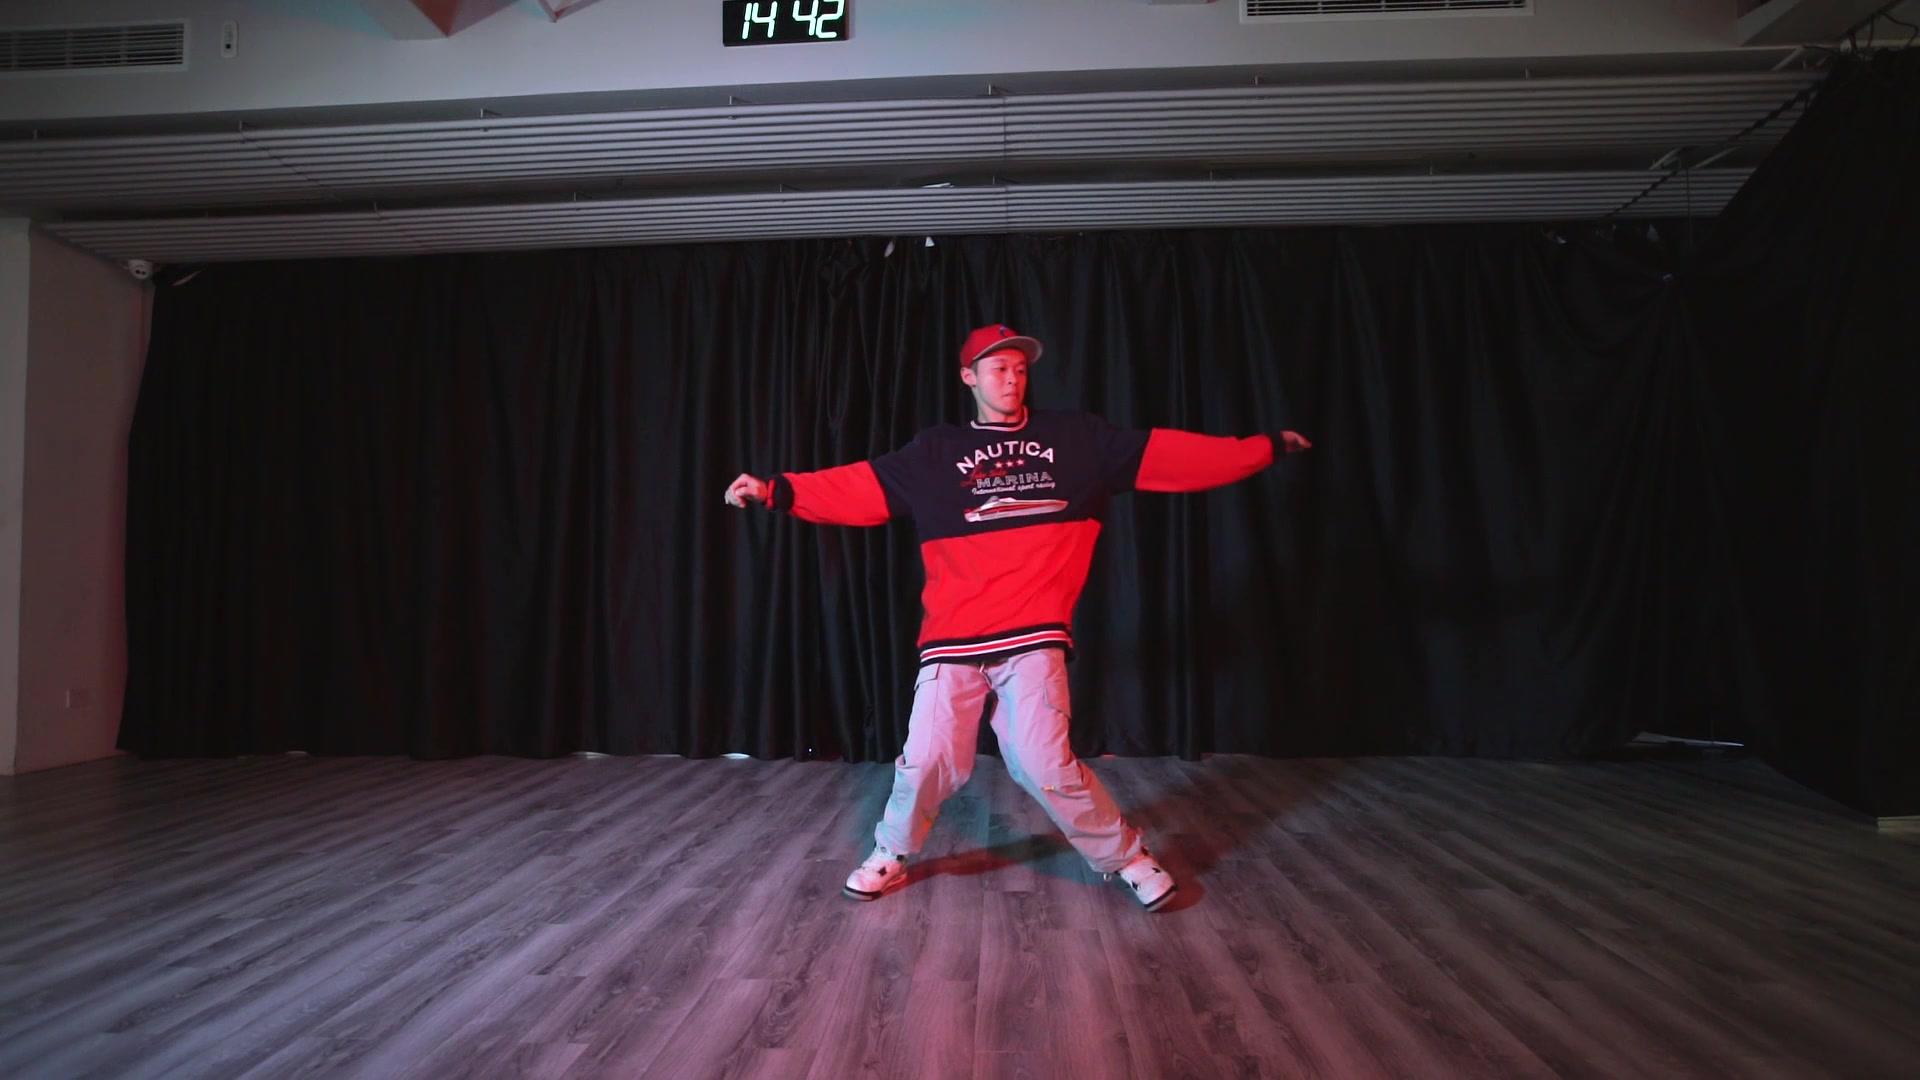 CASTER舞蹈作品 |  CHAIKA - Pulp Fiction